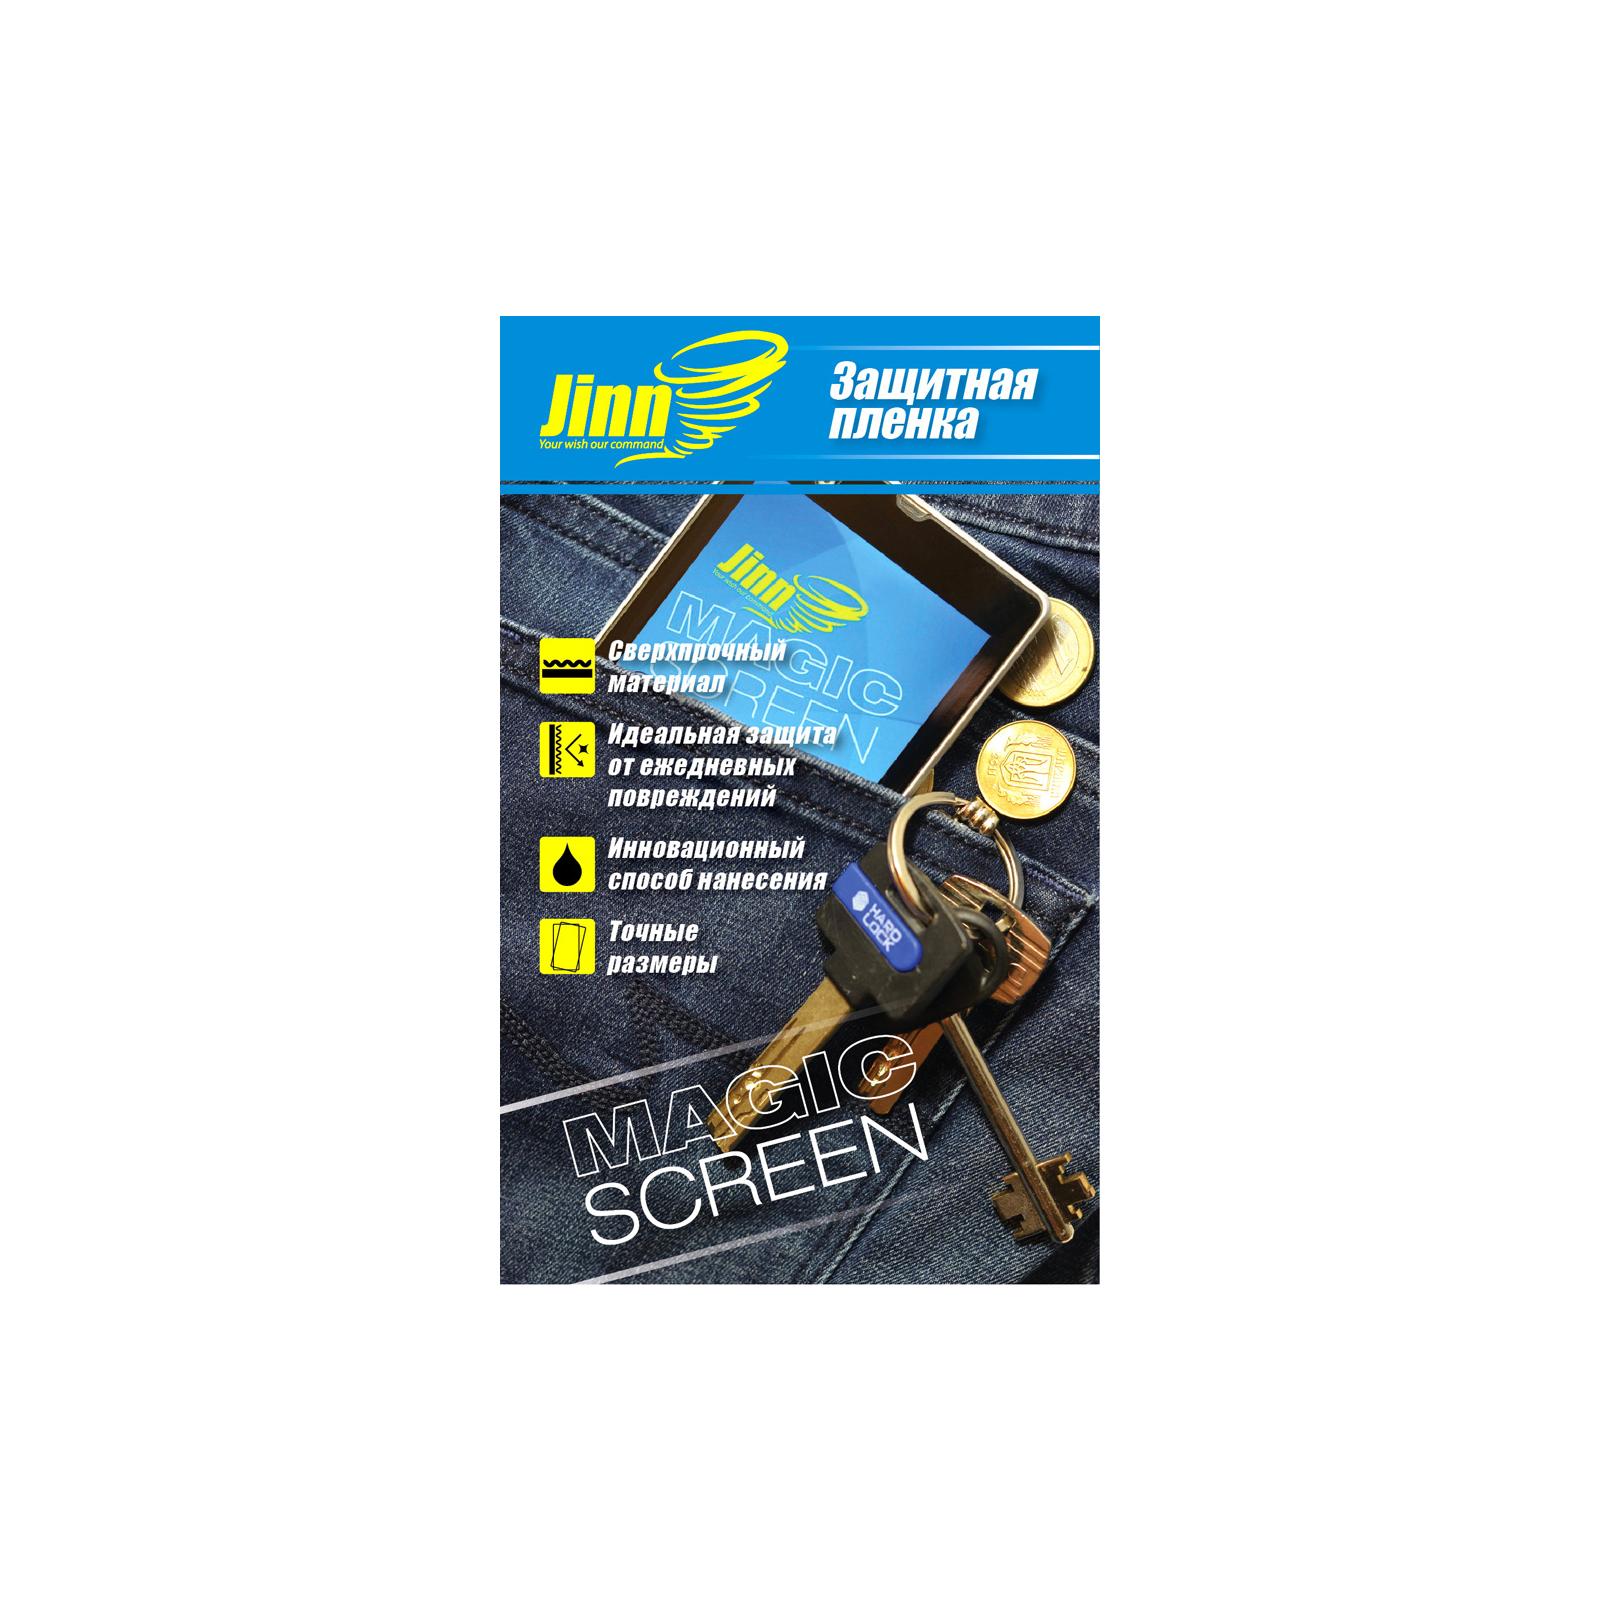 Пленка защитная JINN ультрапрочная Magic Screen для Samsung Galaxy Note N7000 (Samsung Galaxy Note front)